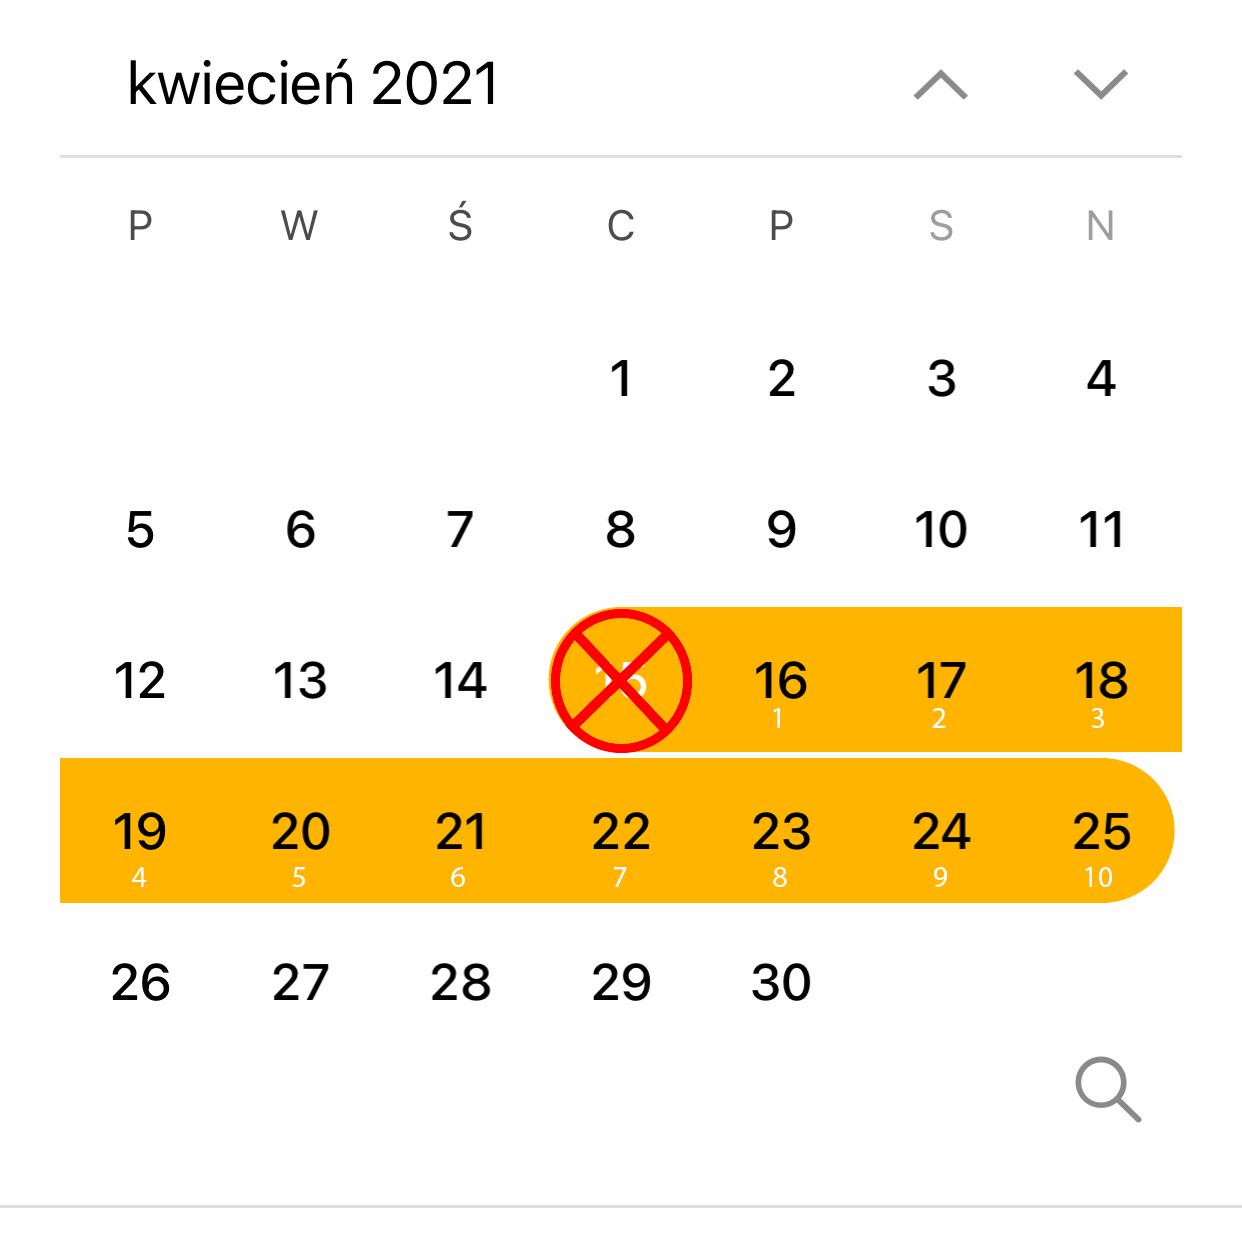 Agenda calendar next 10 days correct version